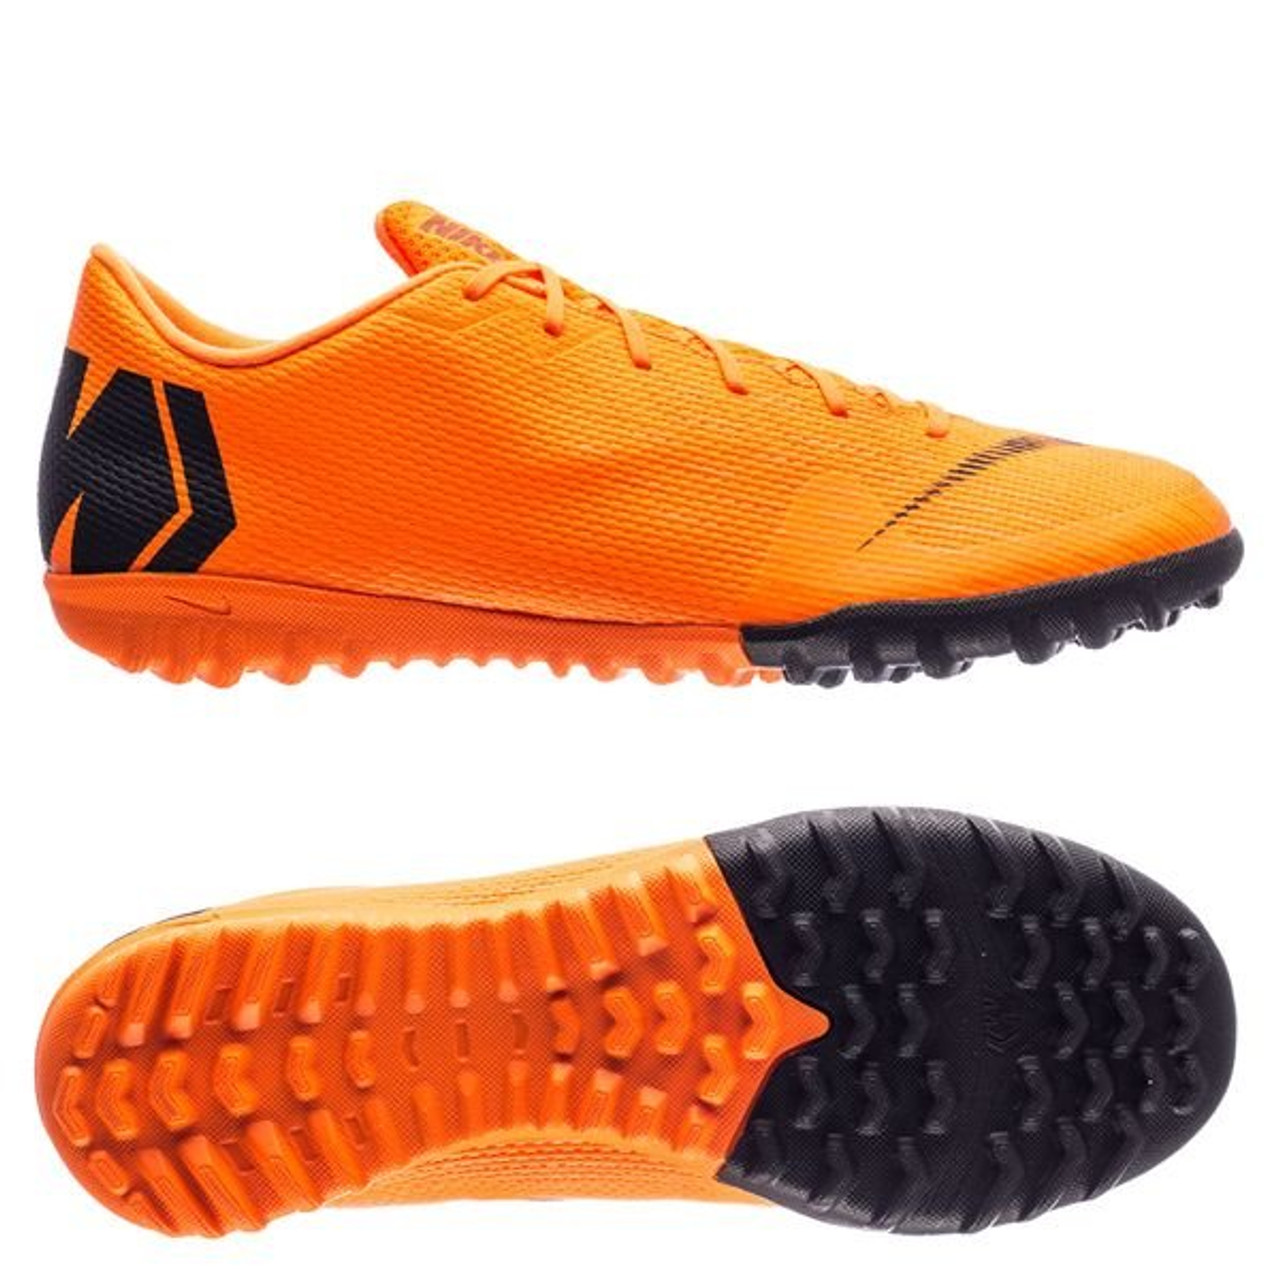 wholesale dealer cdad0 b05ca NIKE VAPORX 12 ACADEMY TF ORANGE - Soccer Plus